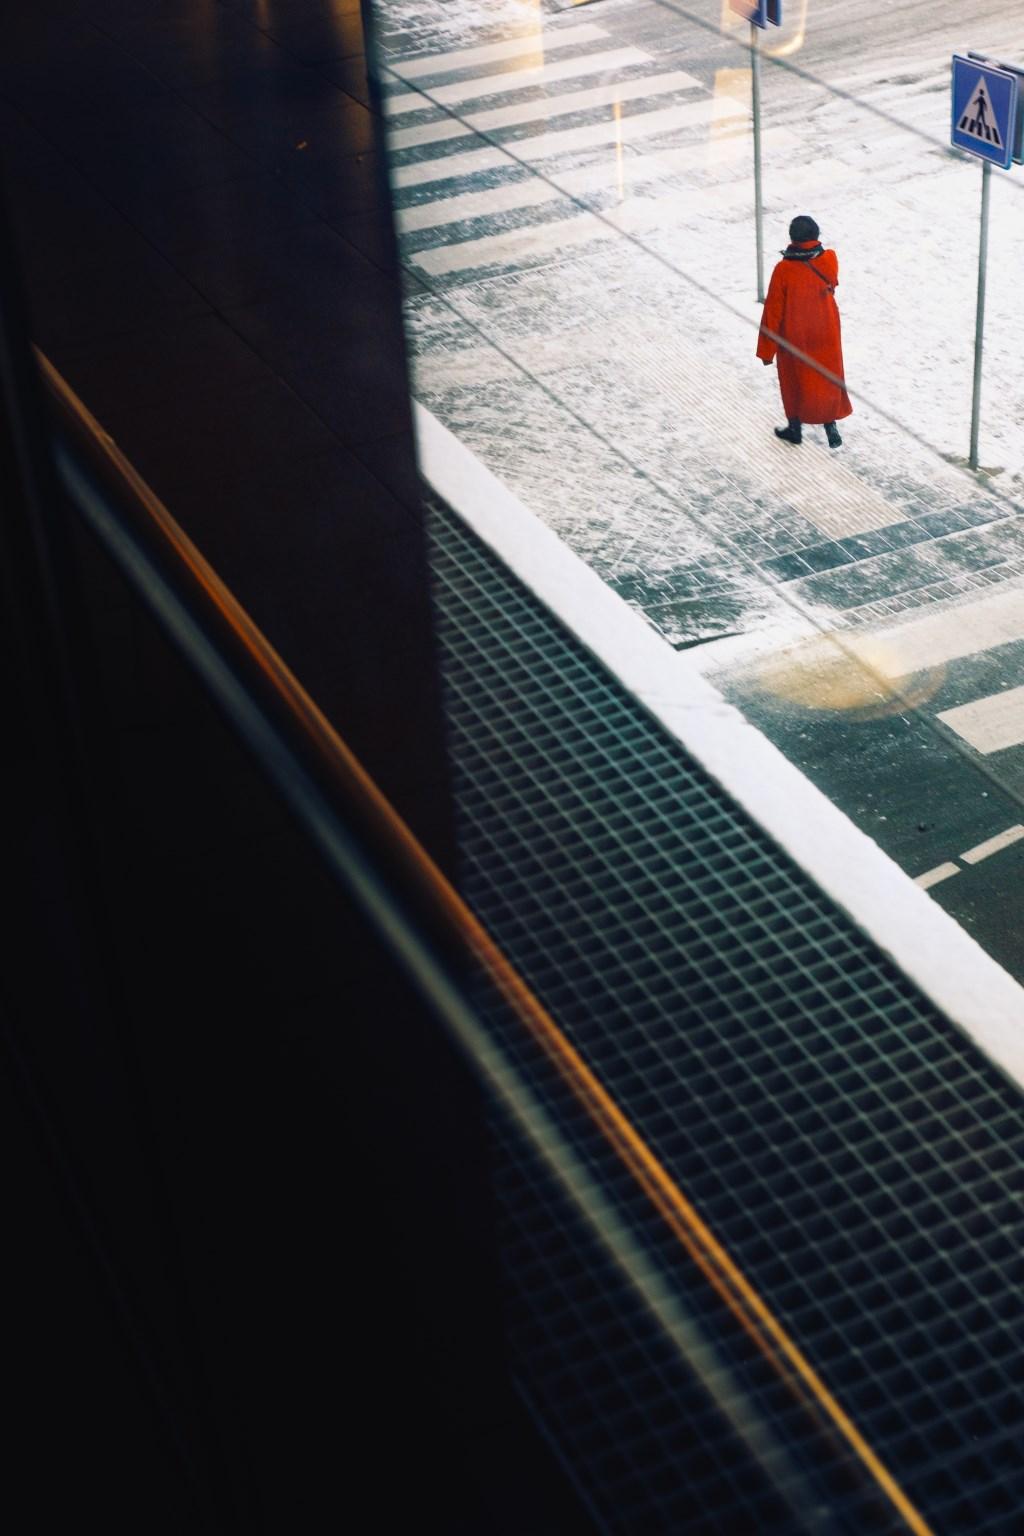 Woman in Red, Amsterdam Airport Schiphol. Bas Hordijk © BDU media